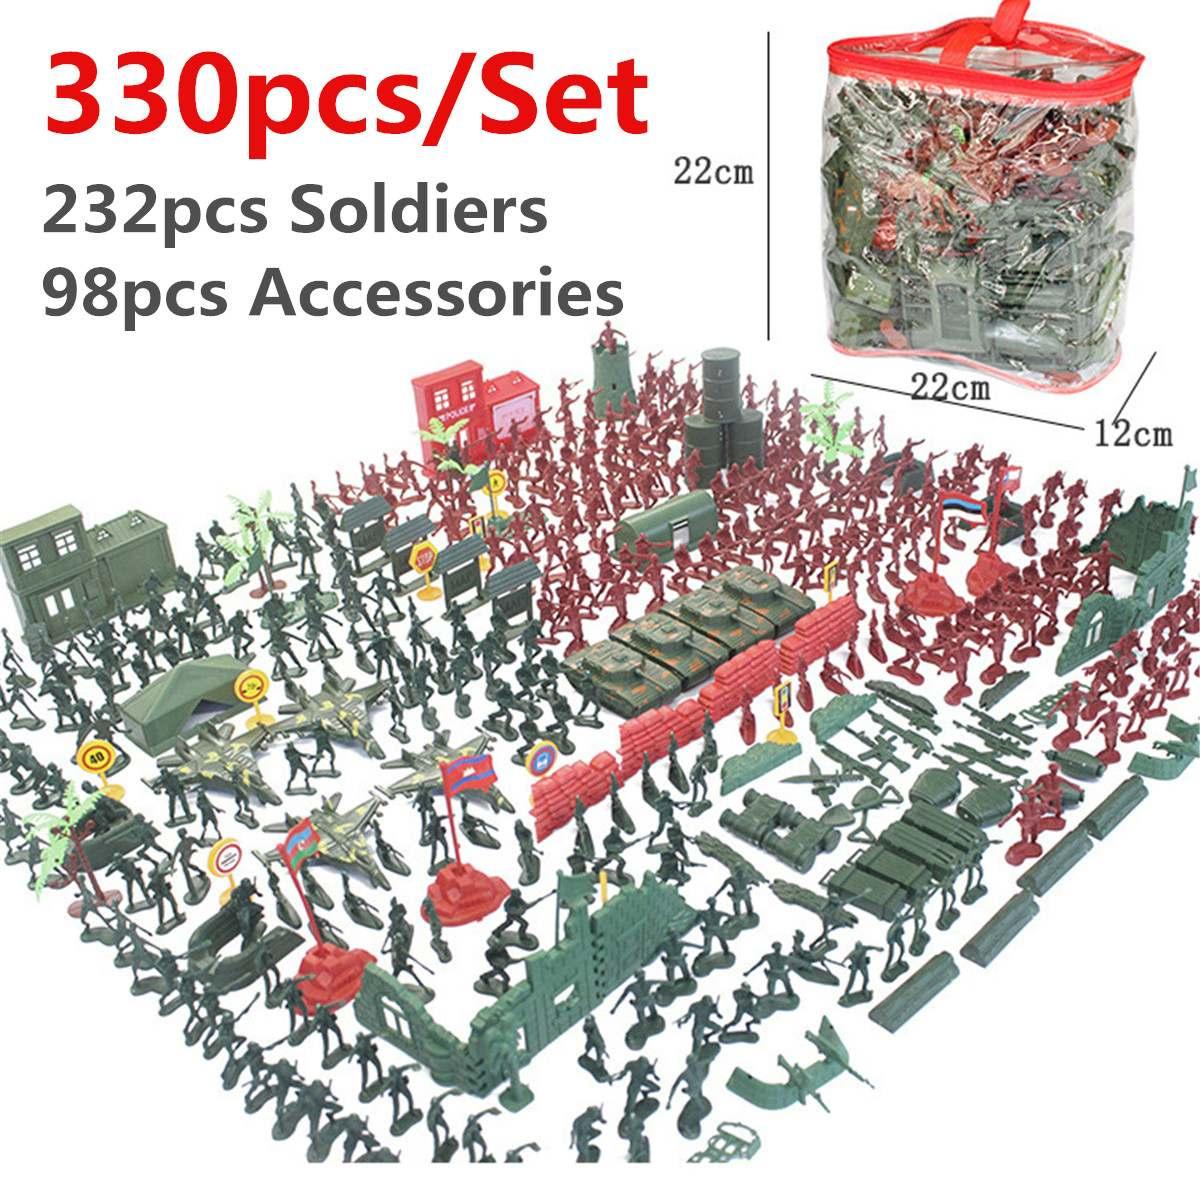 290pcs/330pcs/set Military Plastic Model Playset Kit Toy  Army Men Figures & Accessories Decor Gift Model Toys For Children